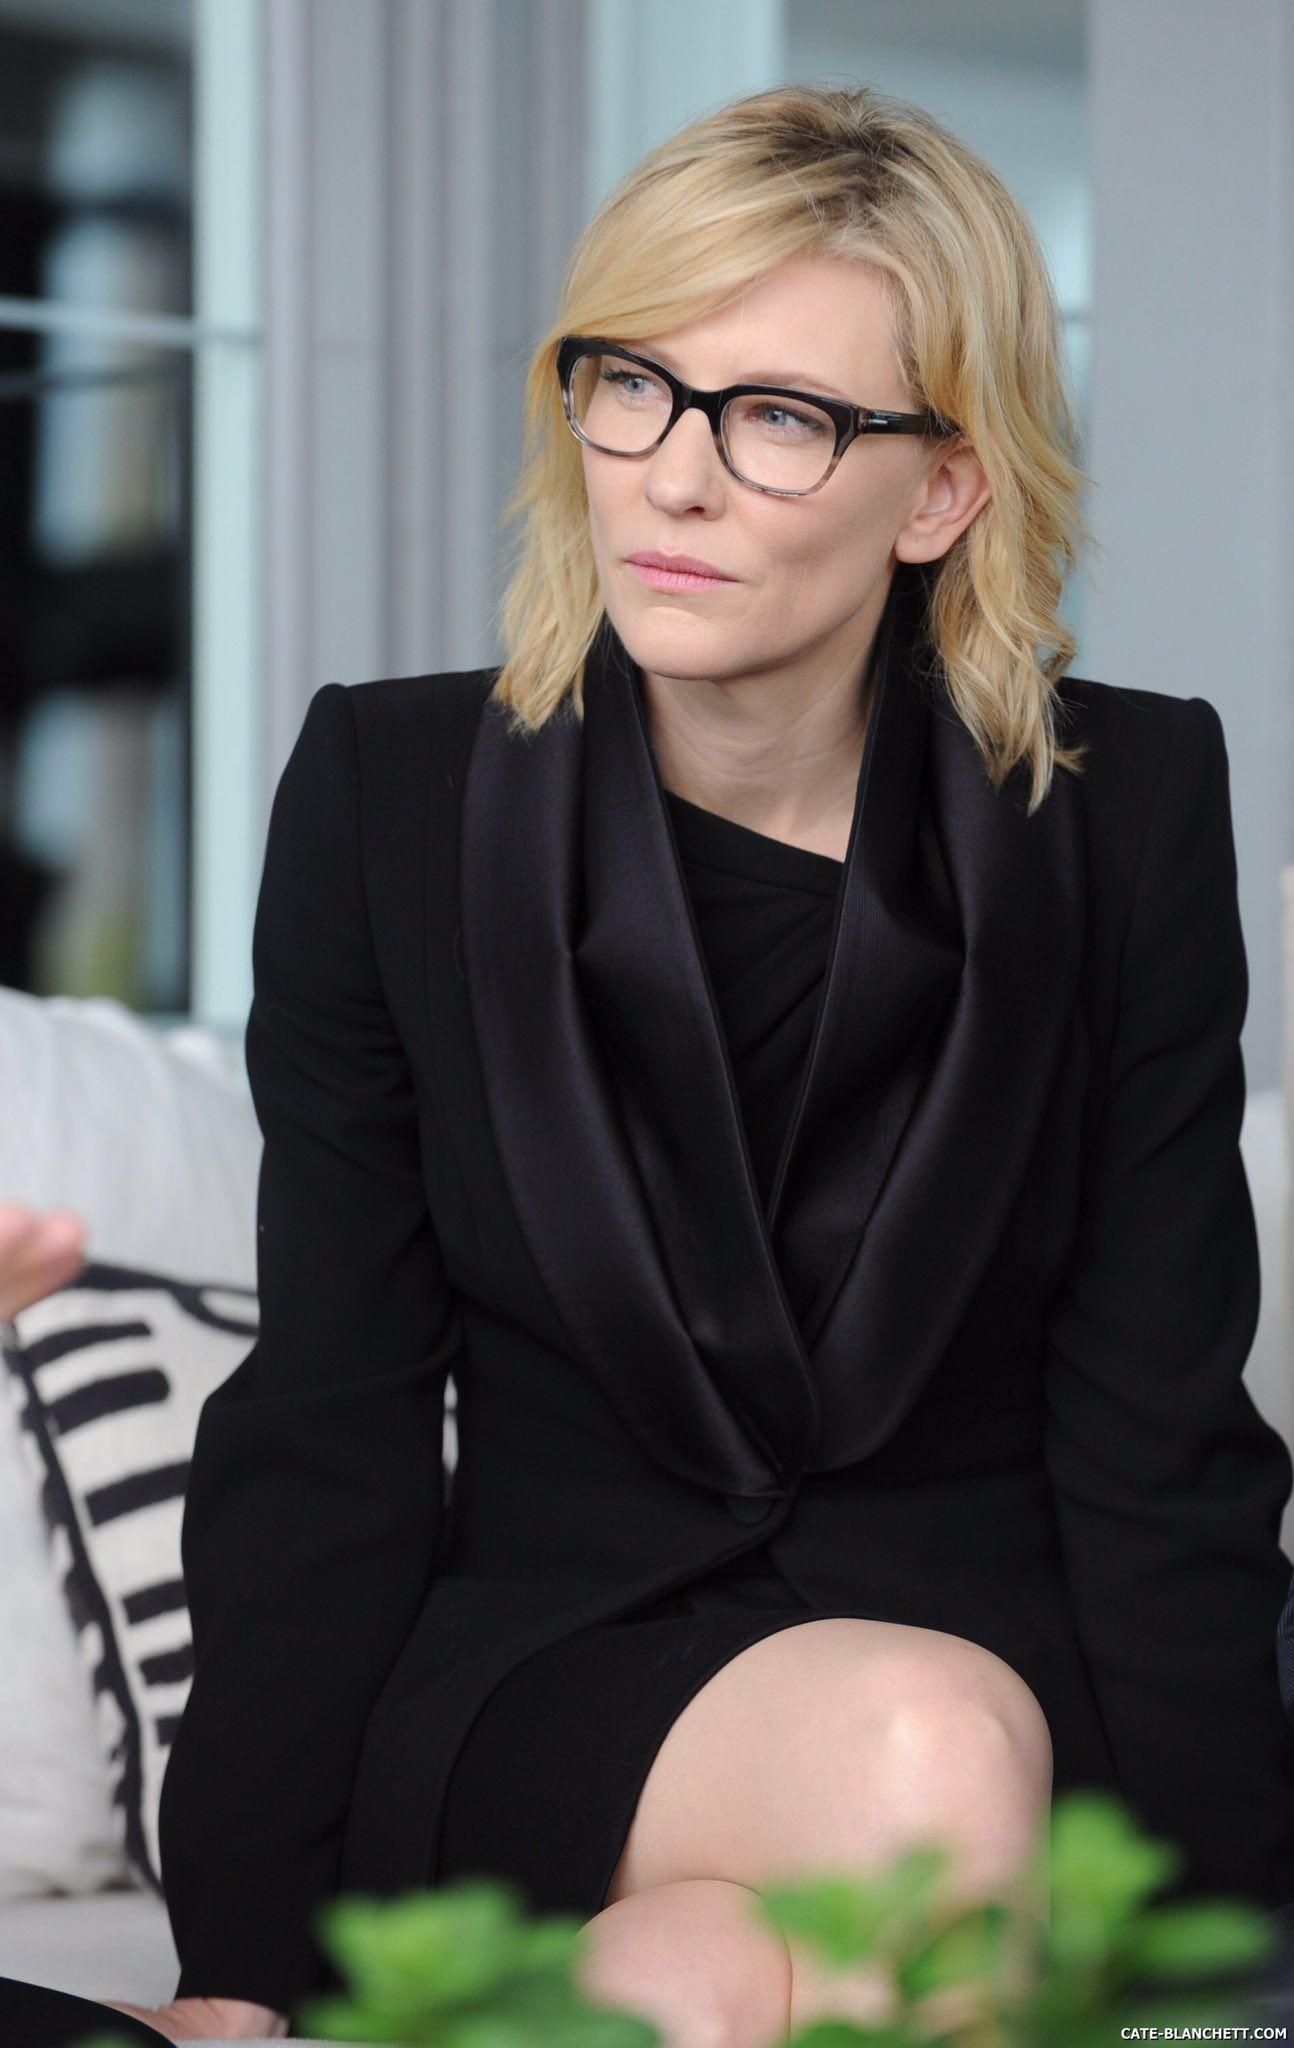 Jan ミ On Twitter In 2020 Cate Blanchett Cate Blanchett Films Fashion